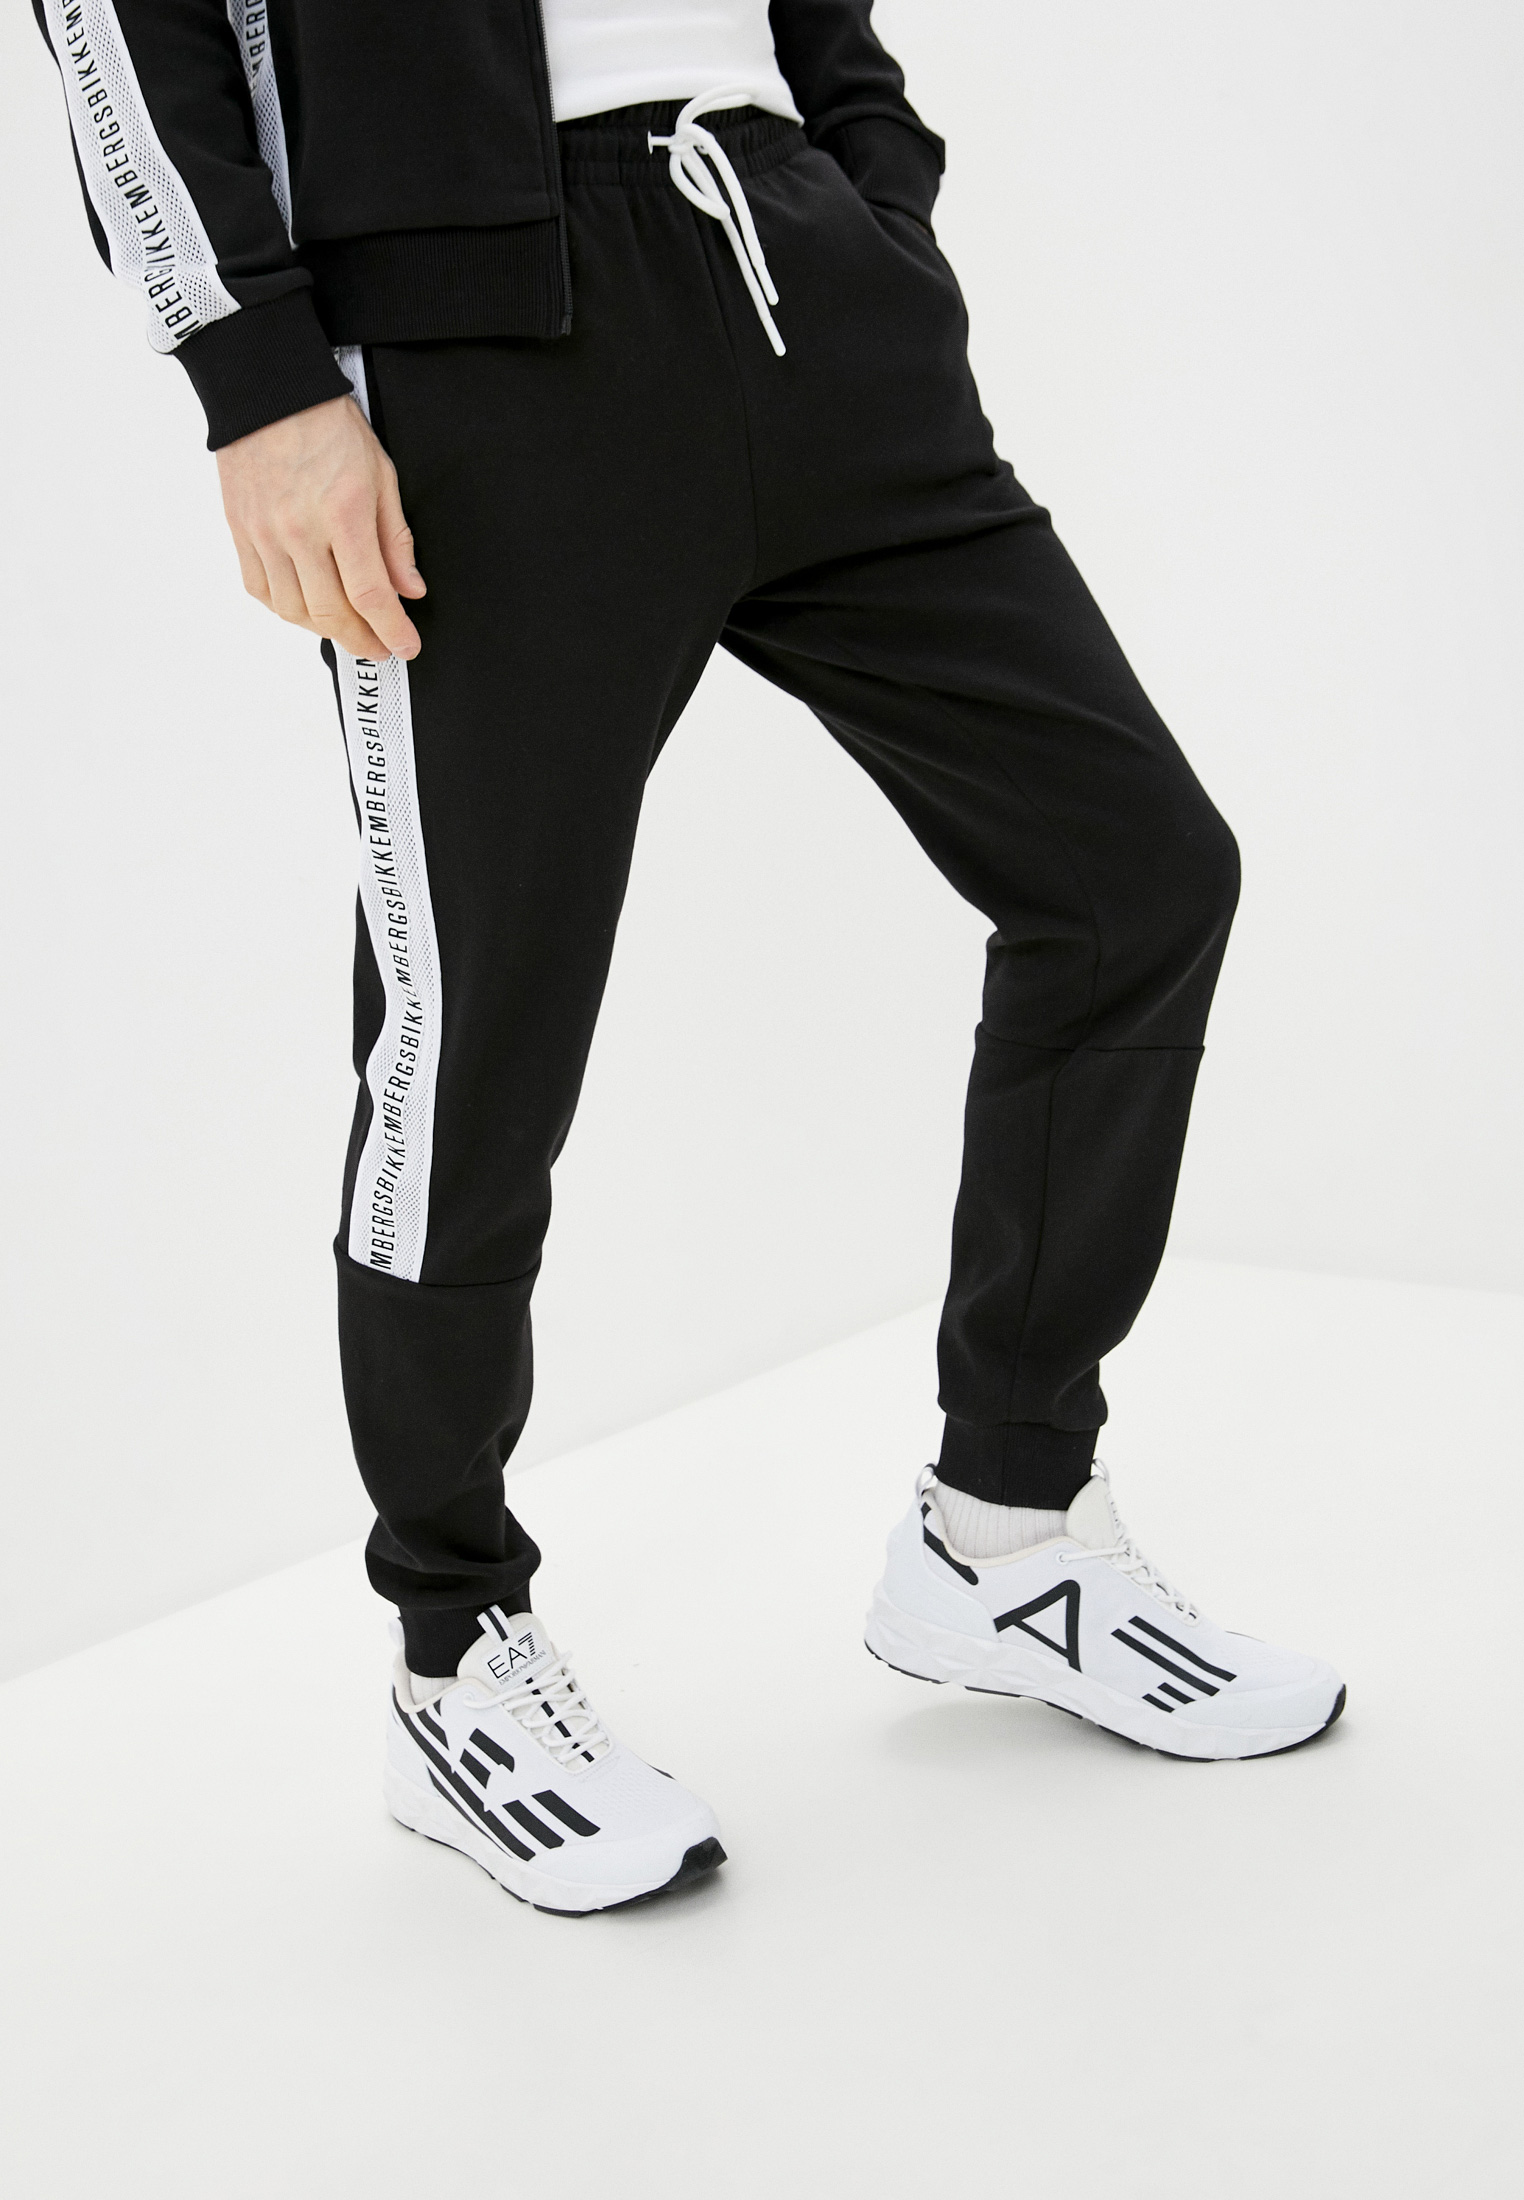 Мужские спортивные брюки Bikkembergs (Биккембергс) C 1 173 80 M 4272